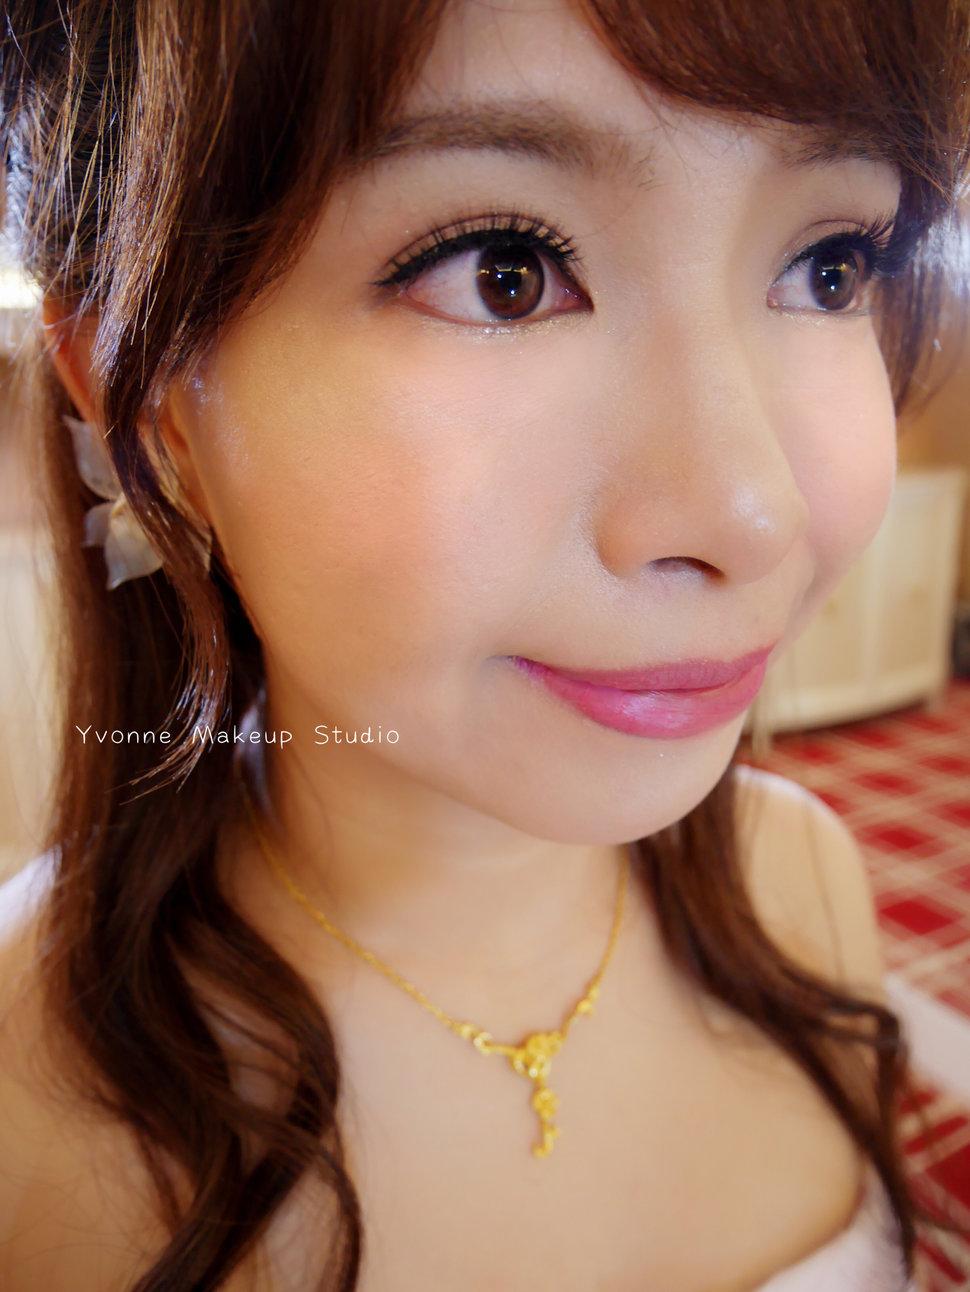 IMG_7333 - 做懂妳的新秘 Yvonne 嘉云《結婚吧》